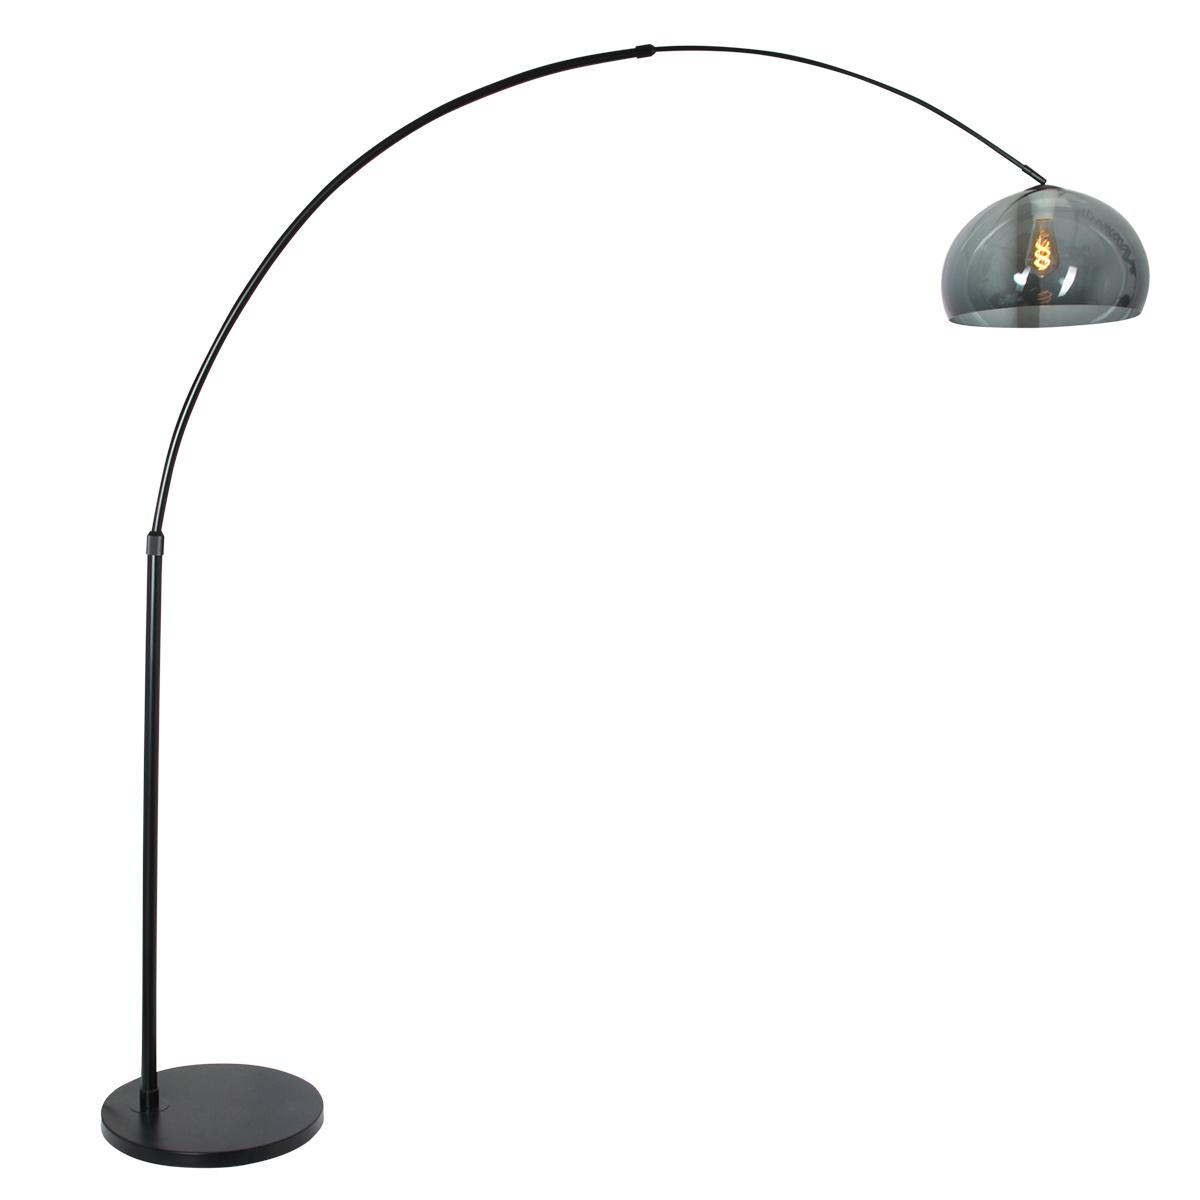 Steinhauer Vloerlamp Sparkled light 9878 zwart kunststof grijze kap